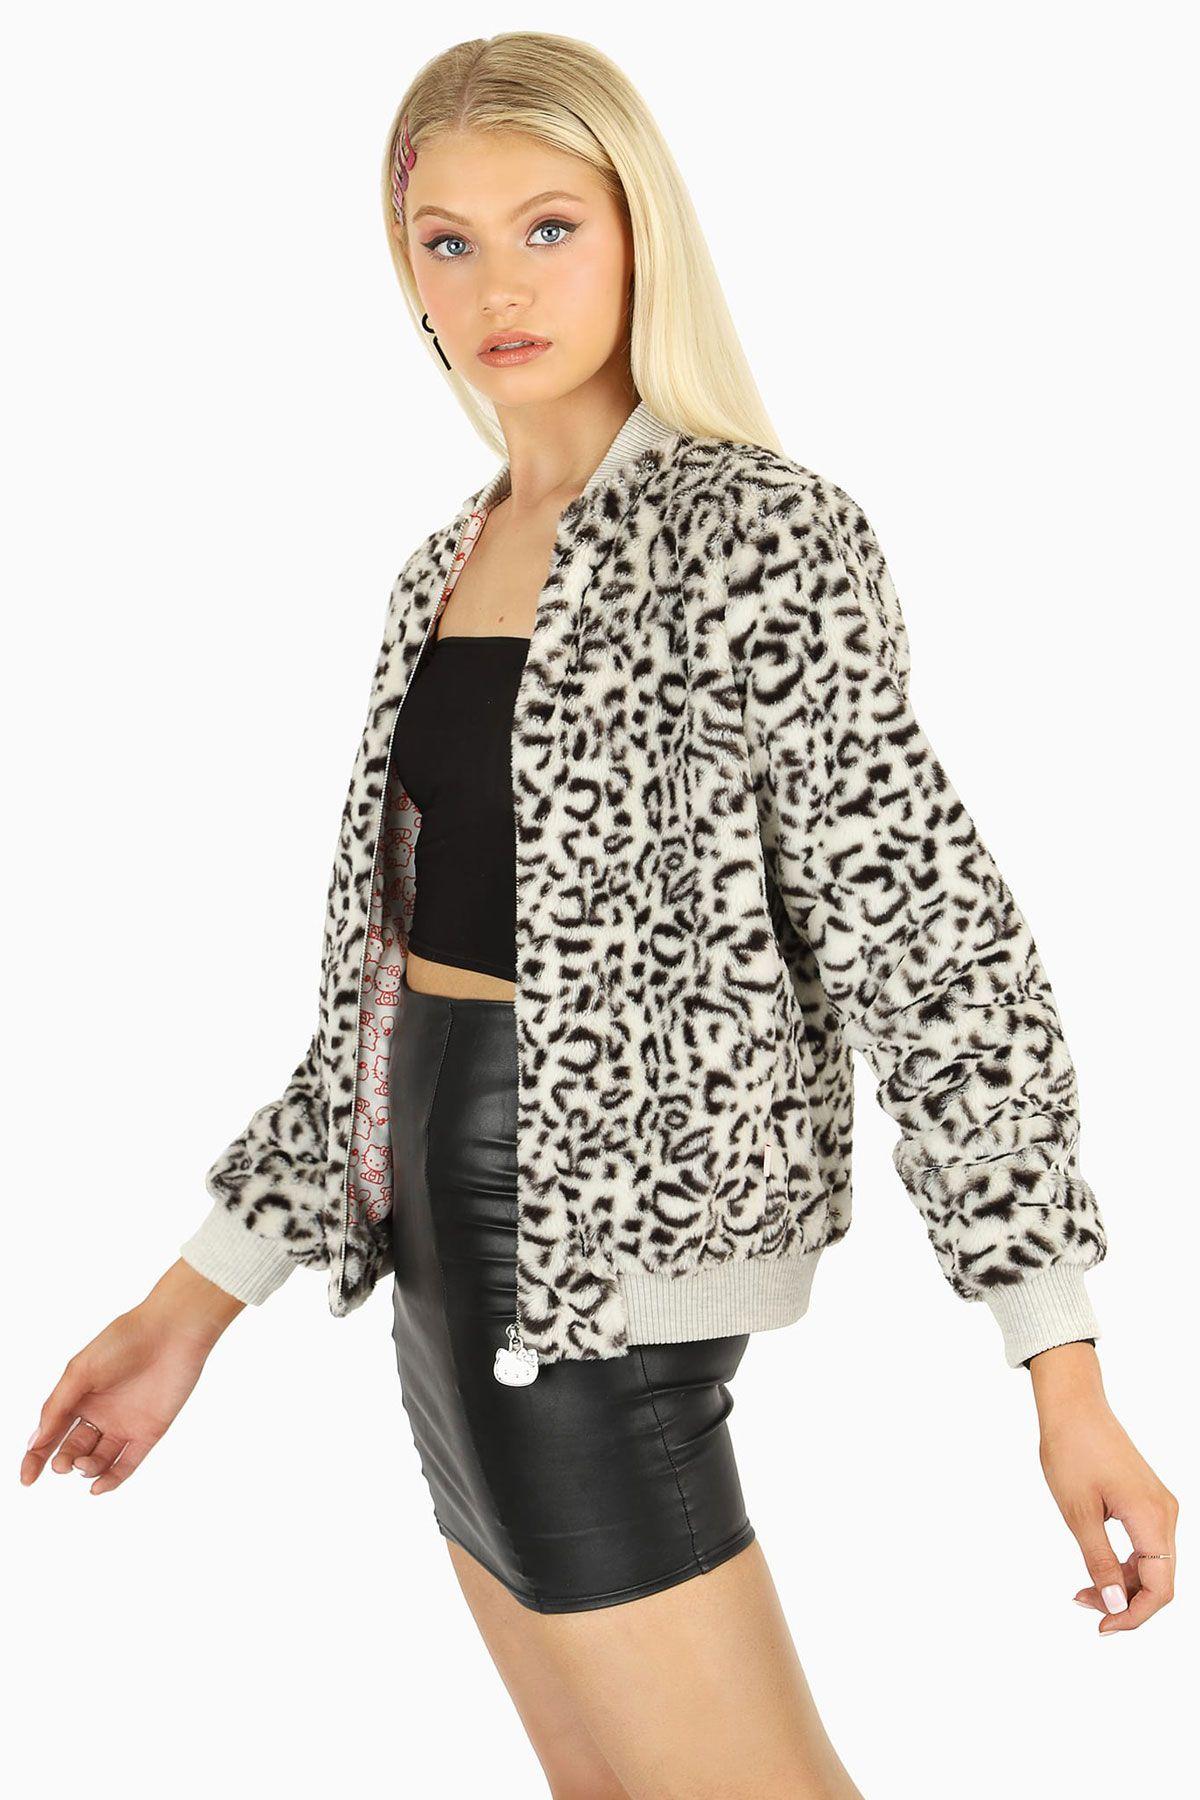 Hello Kitty Friends Furever Bomber Jacket Bm Limited Black Milk Clothing Bomber Jacket Fashion [ 1800 x 1200 Pixel ]